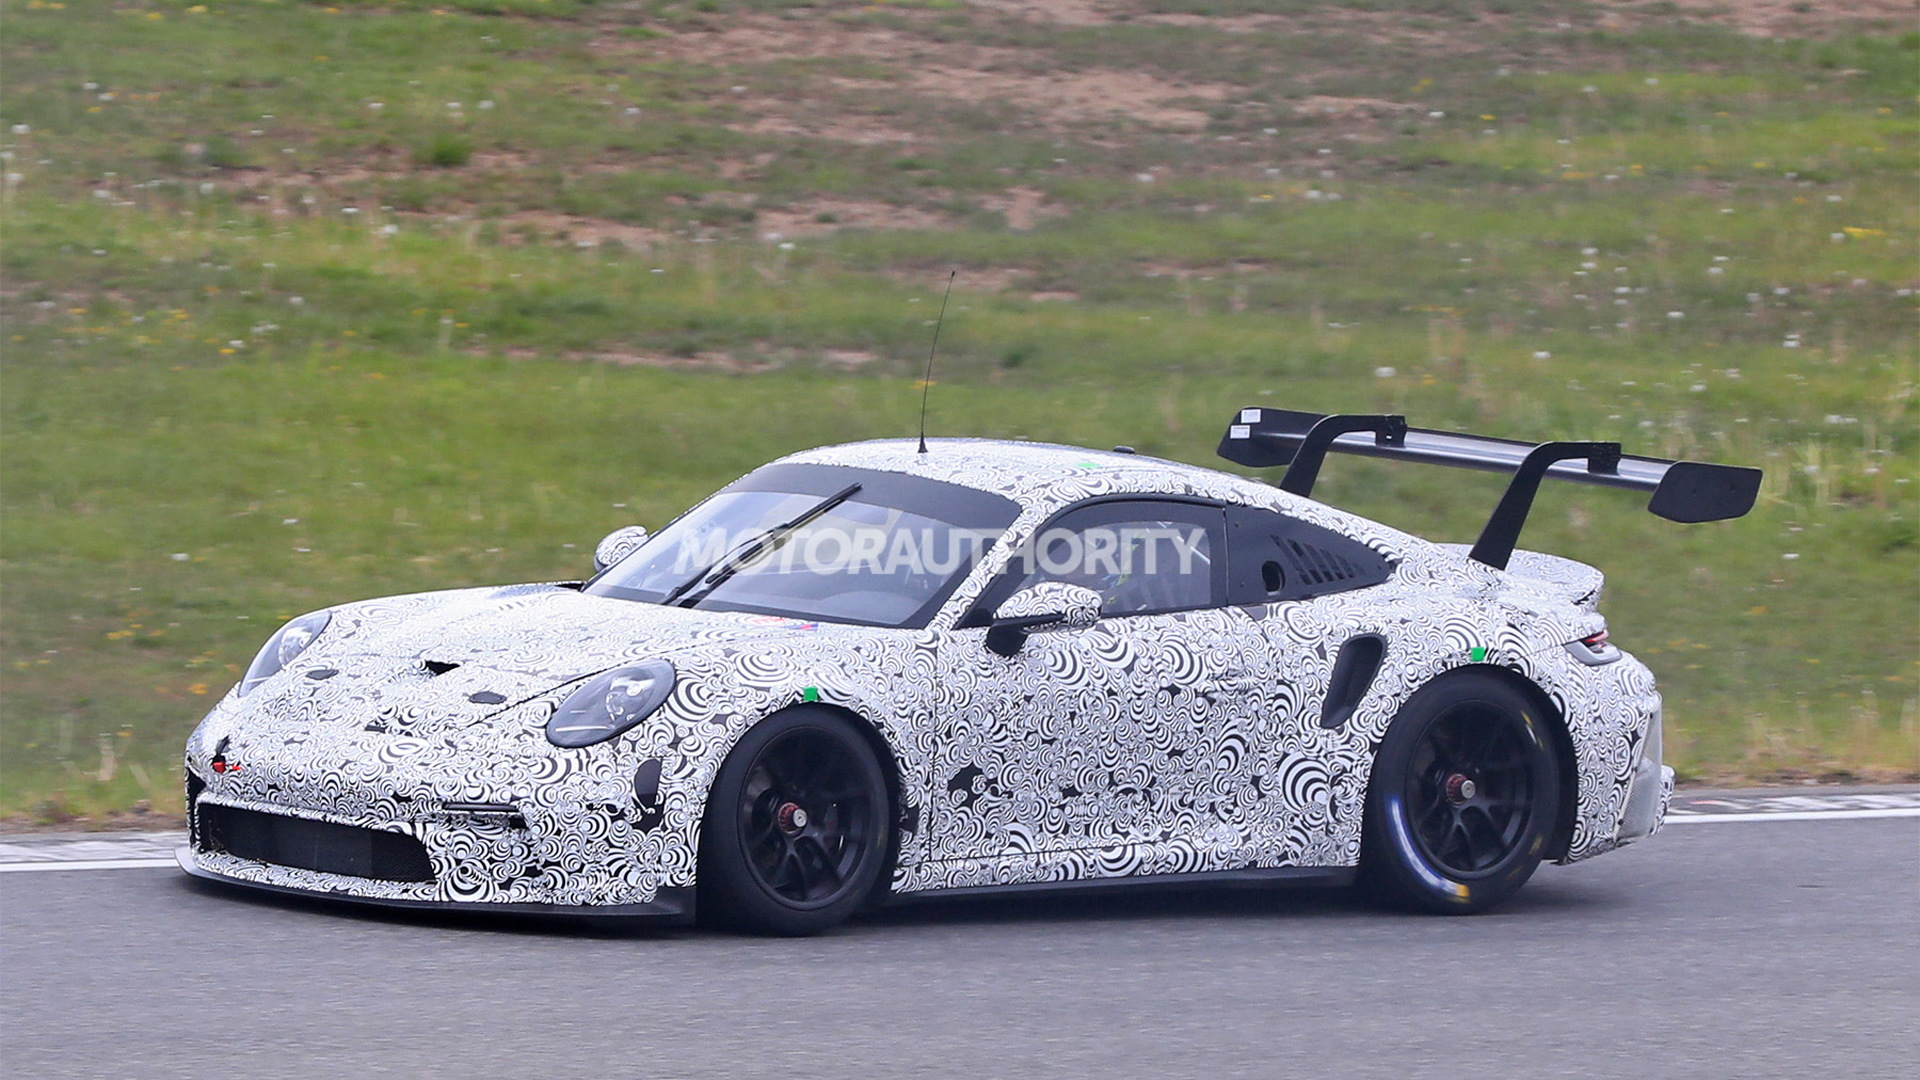 2022 Porsche 911 GT3 R race car spy shots - Photo credit:S. Baldauf/SB-Medien